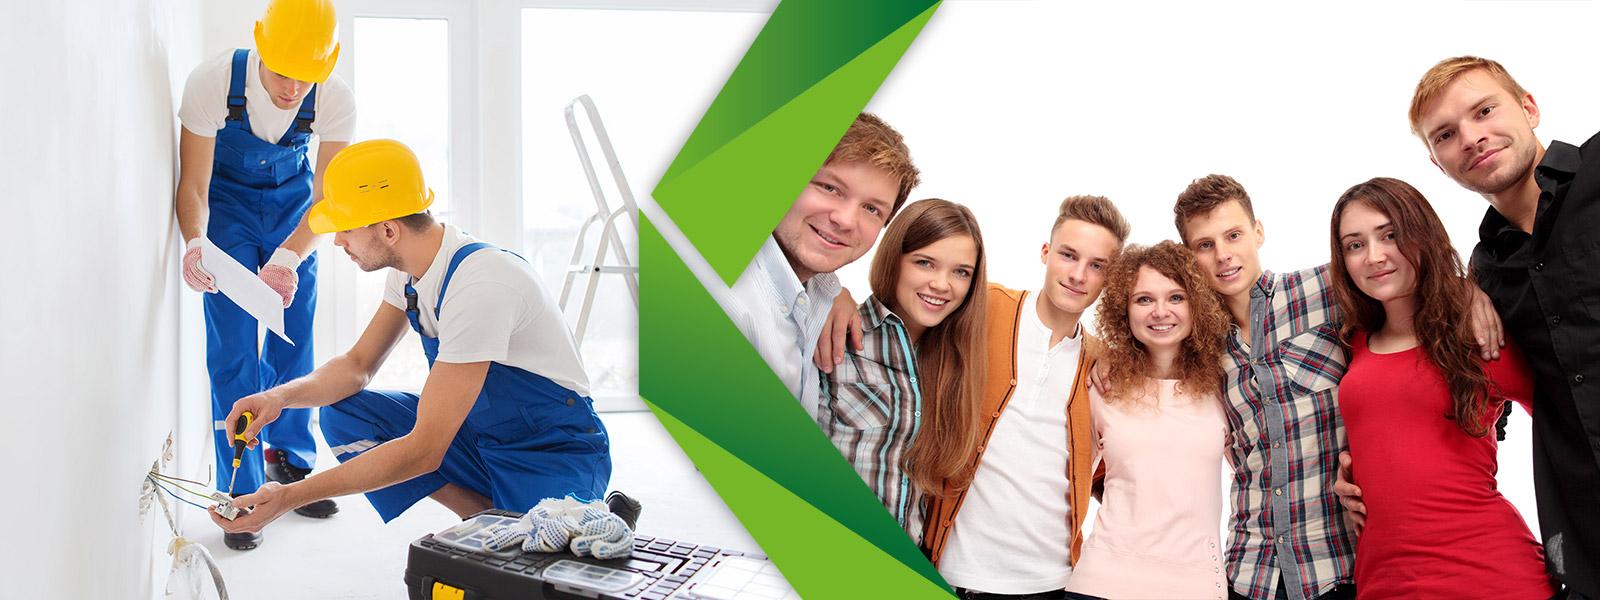 Karp GmbH Karriere Bewerbung